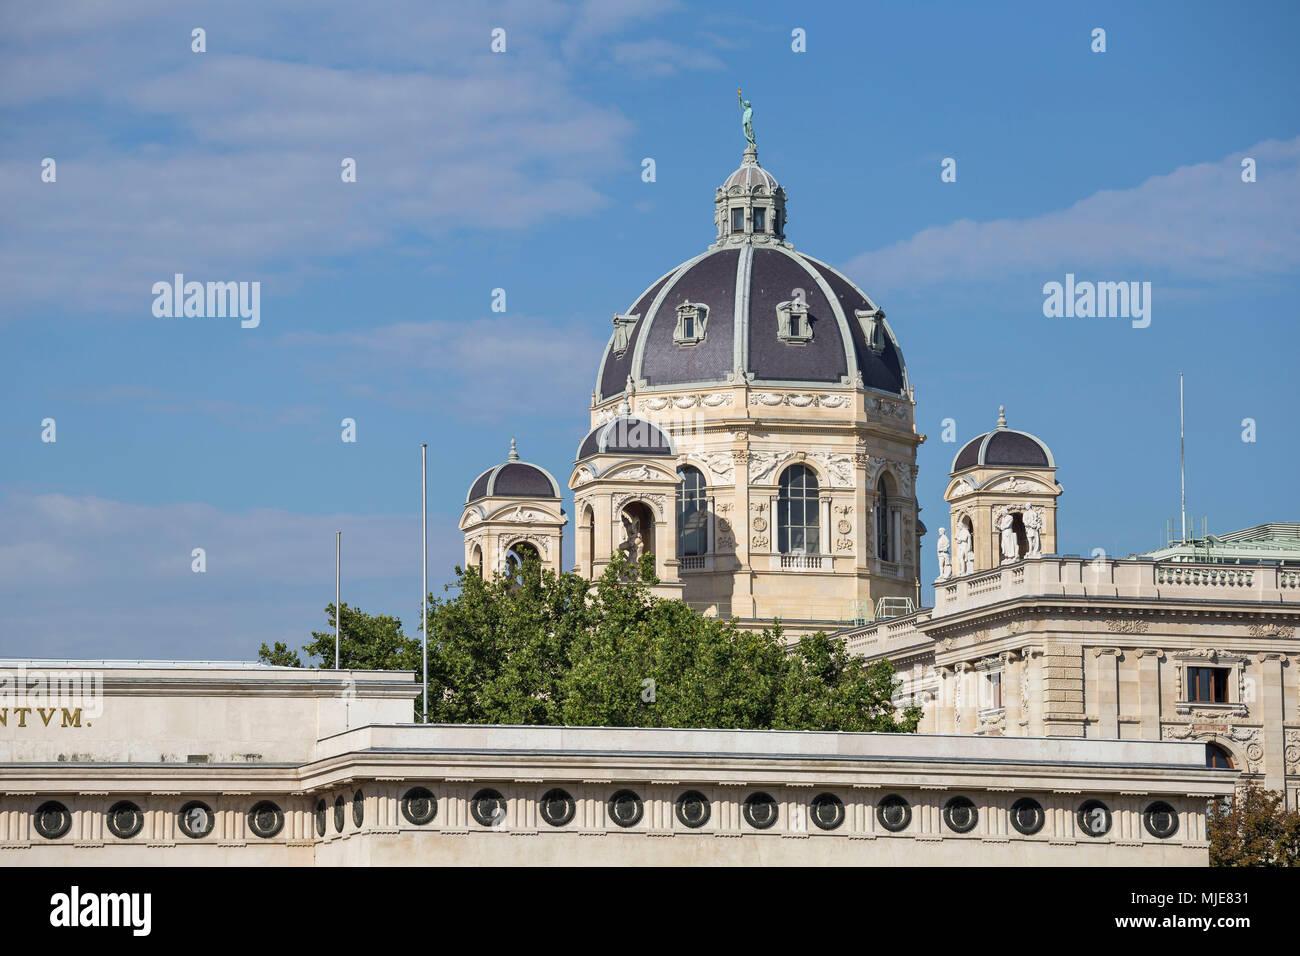 Naturhistorisches Museum, Vienna, Austria, Europe - Stock Image